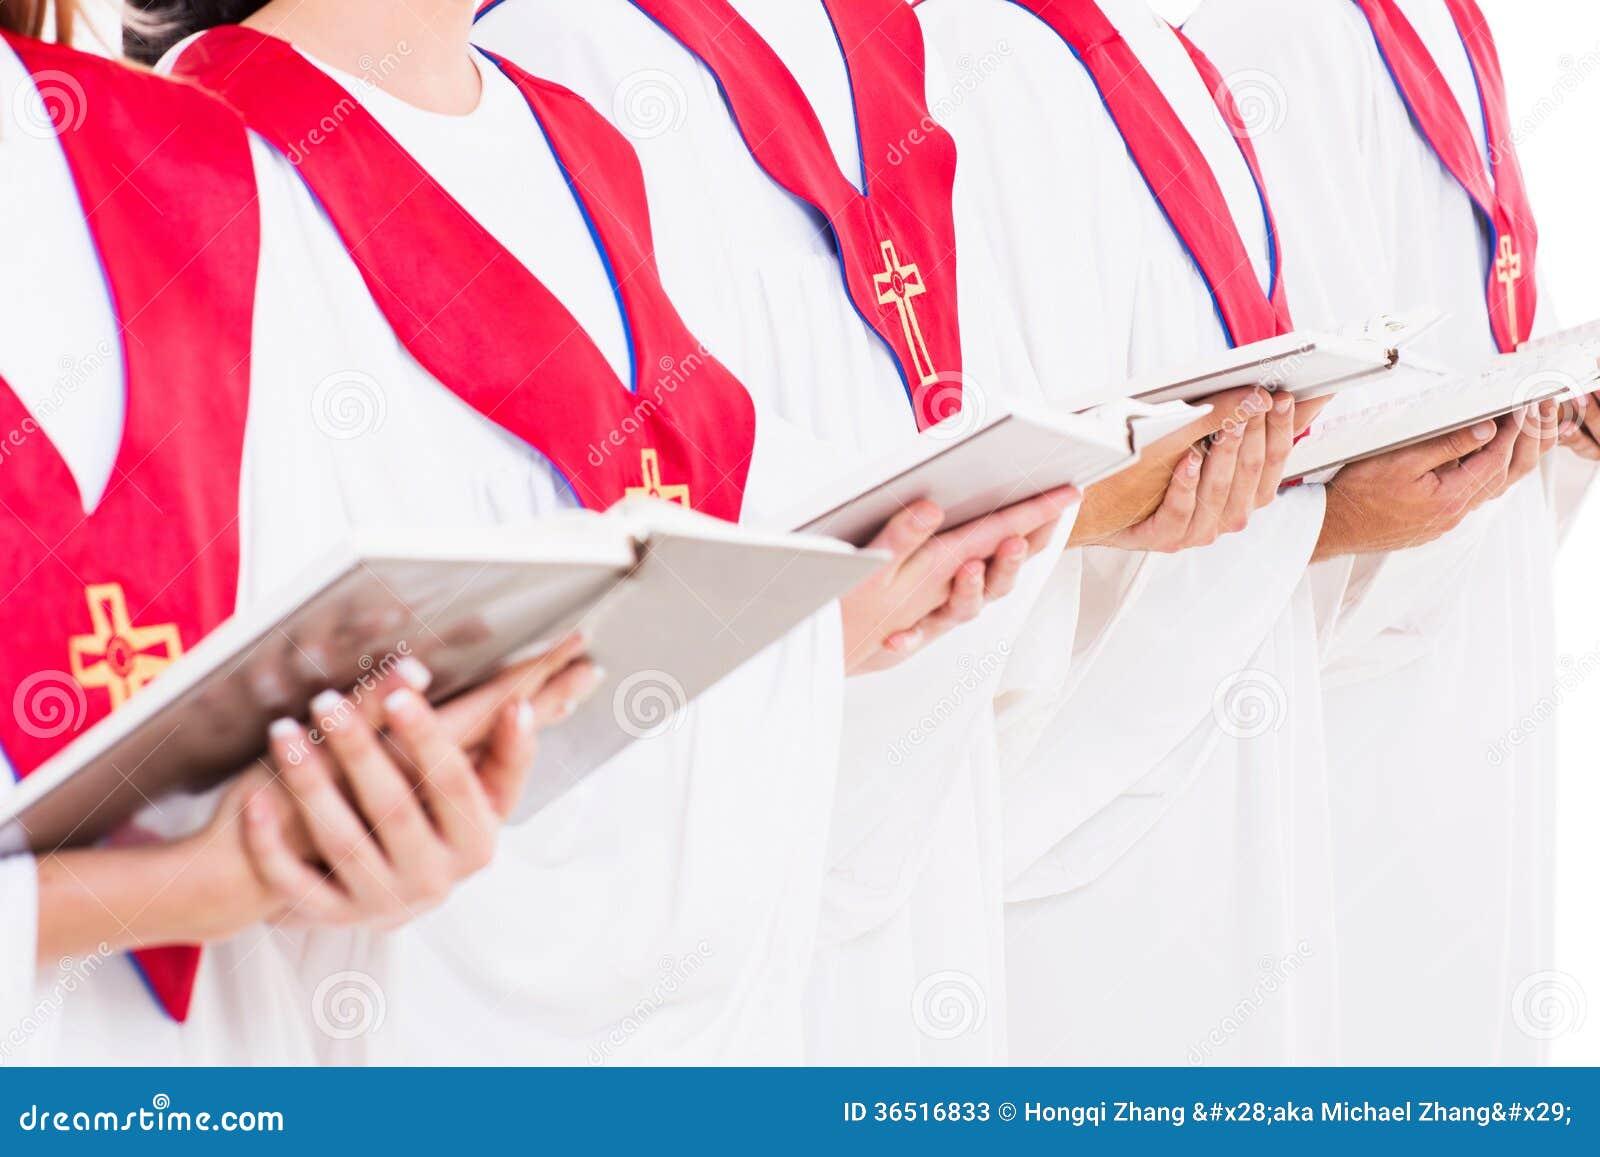 Libros del himno del coro de la iglesia